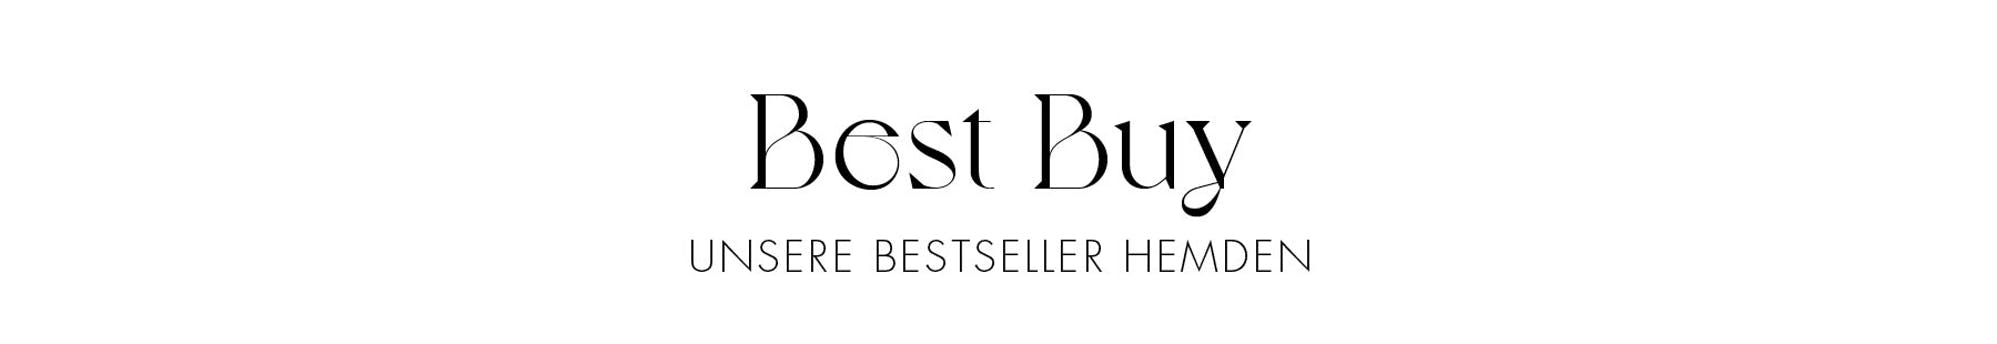 Best Buy - Unsere Bestseller Hemden | Seidensticker